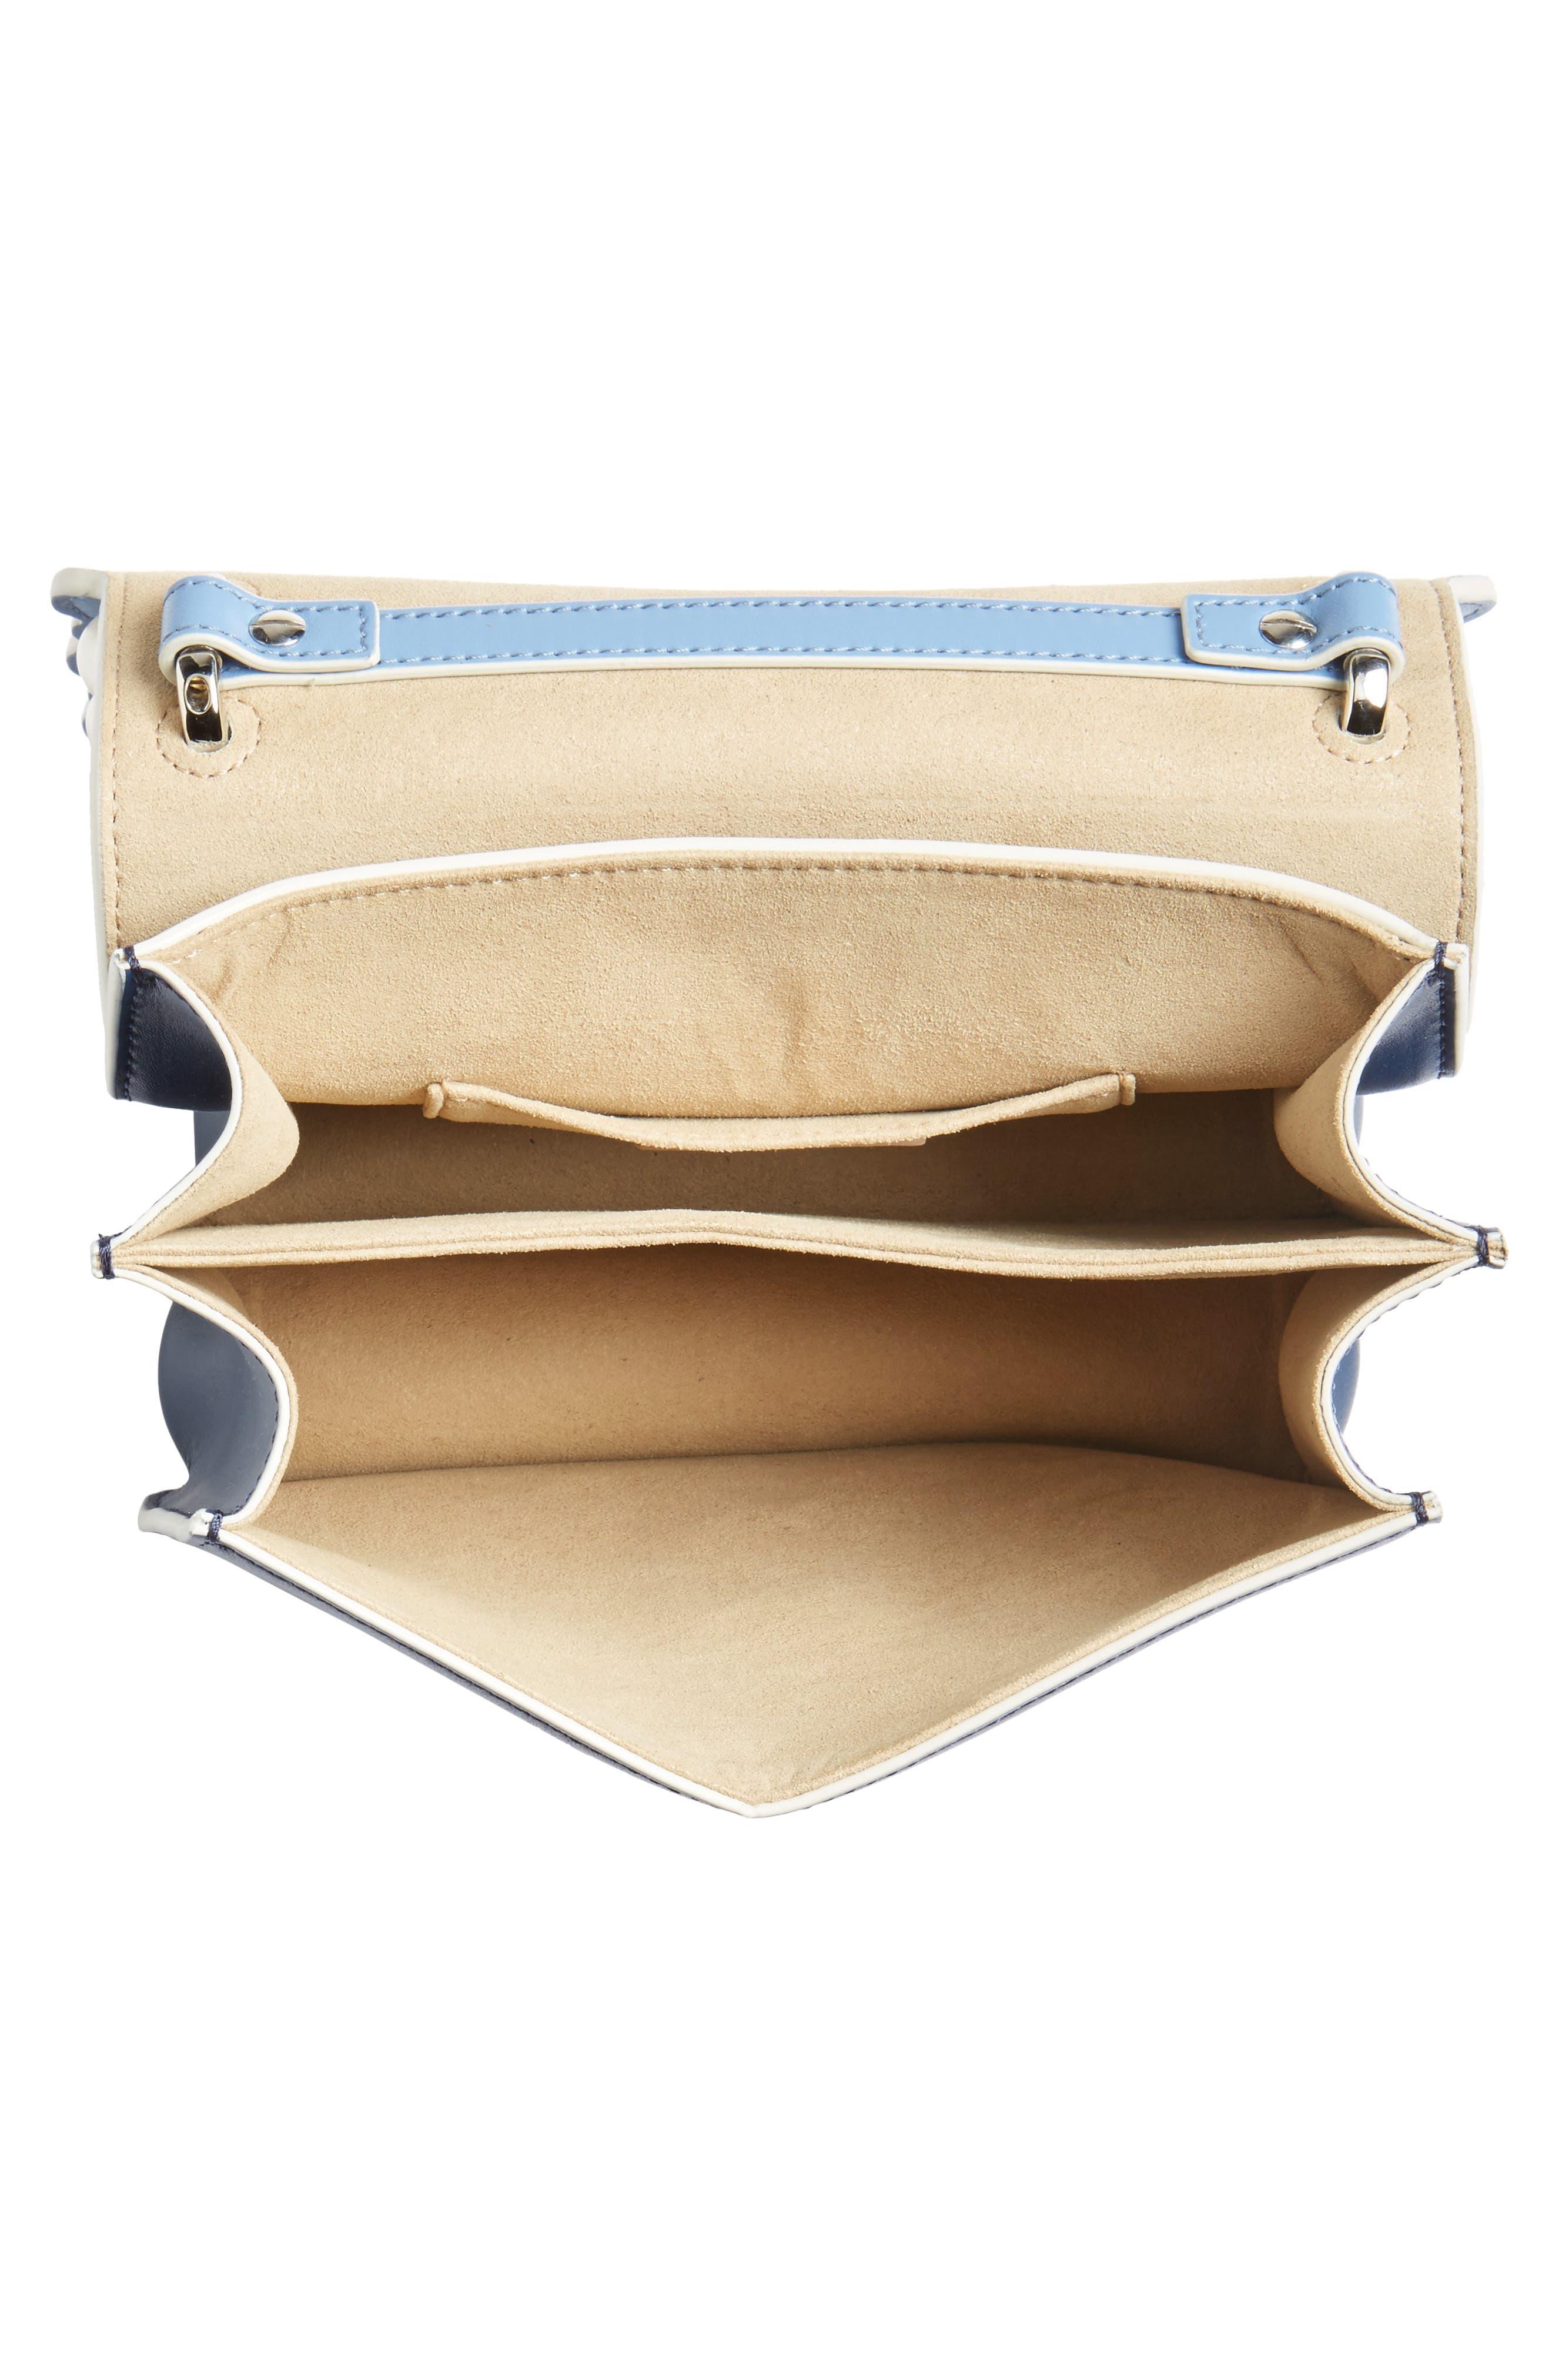 Mini Kan I Imitation Pearl Scallop Leather Shoulder Bag,                             Alternate thumbnail 4, color,                             BLUE